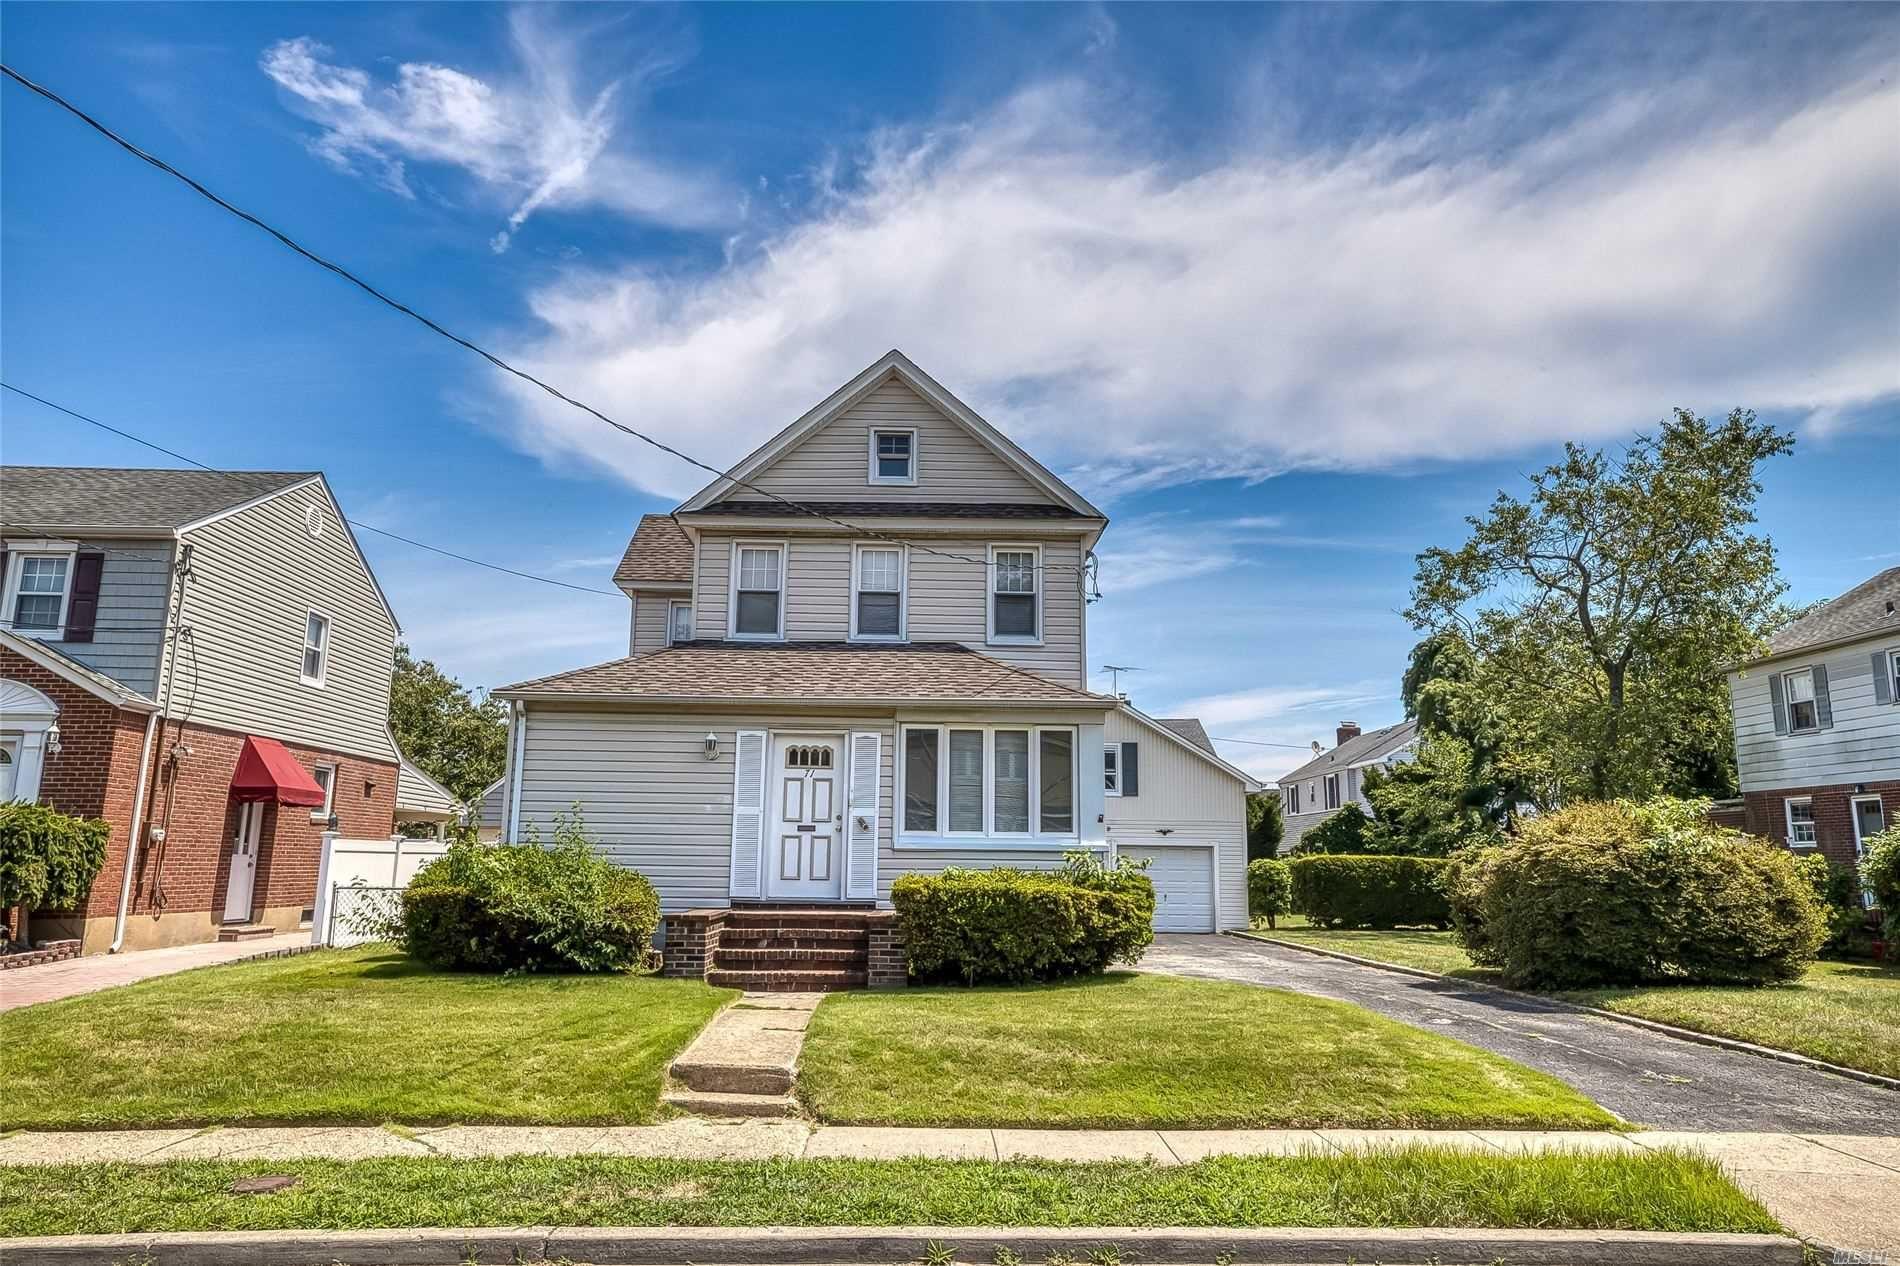 71 Walnut Street, West Hempstead, NY 11552 - MLS#: 3238291